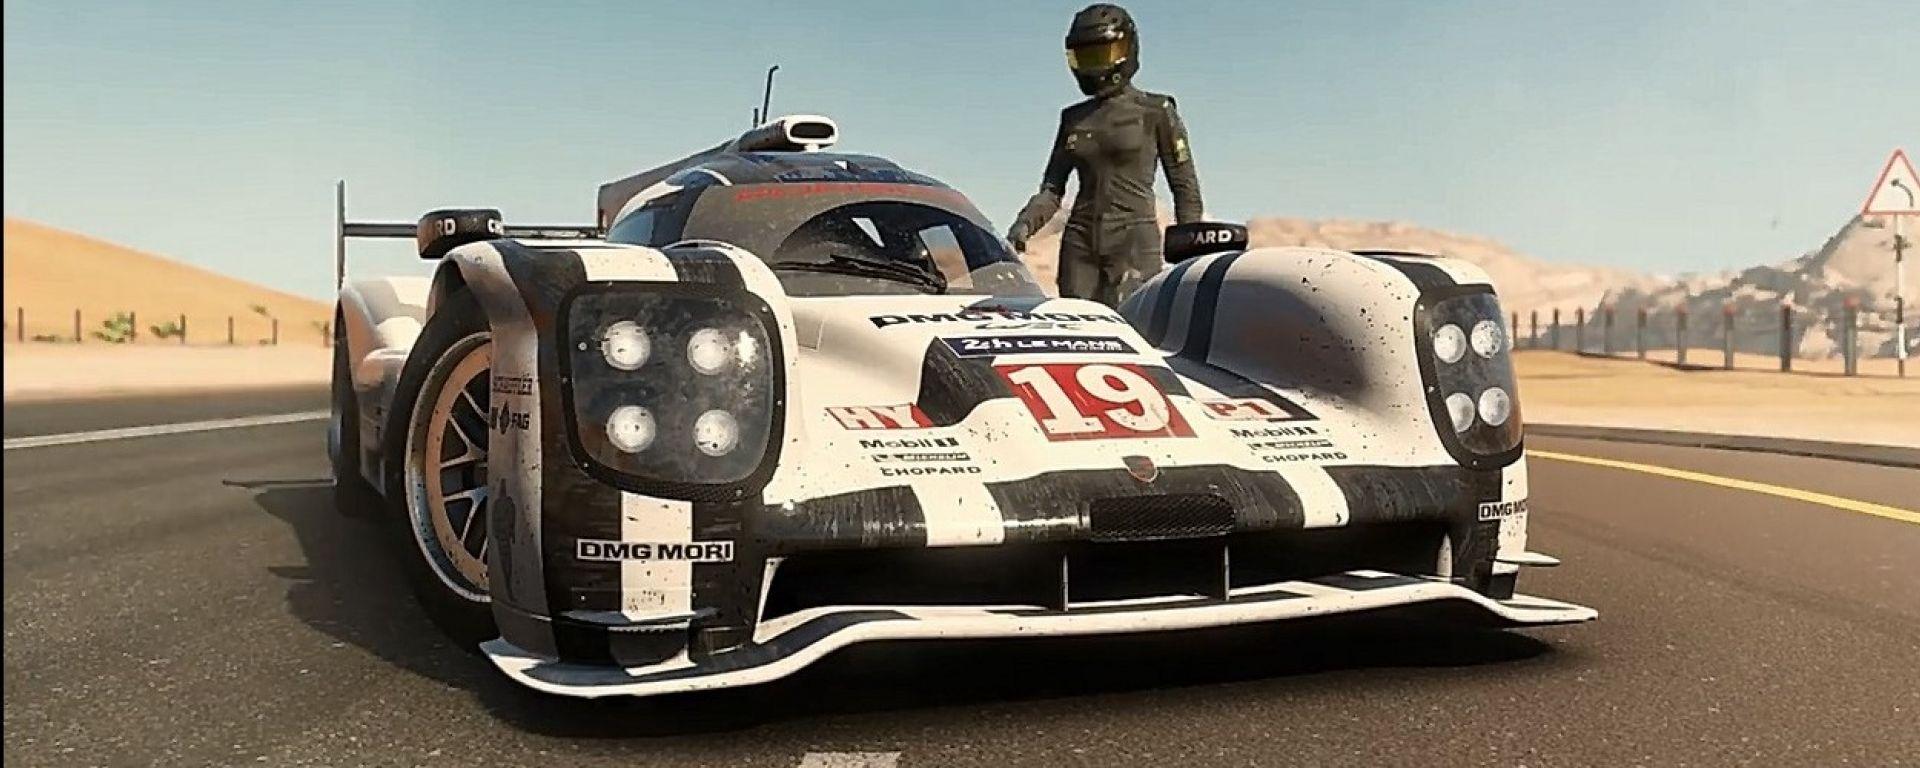 Forza Motorsport 7: la Porsche 919 Hybrid